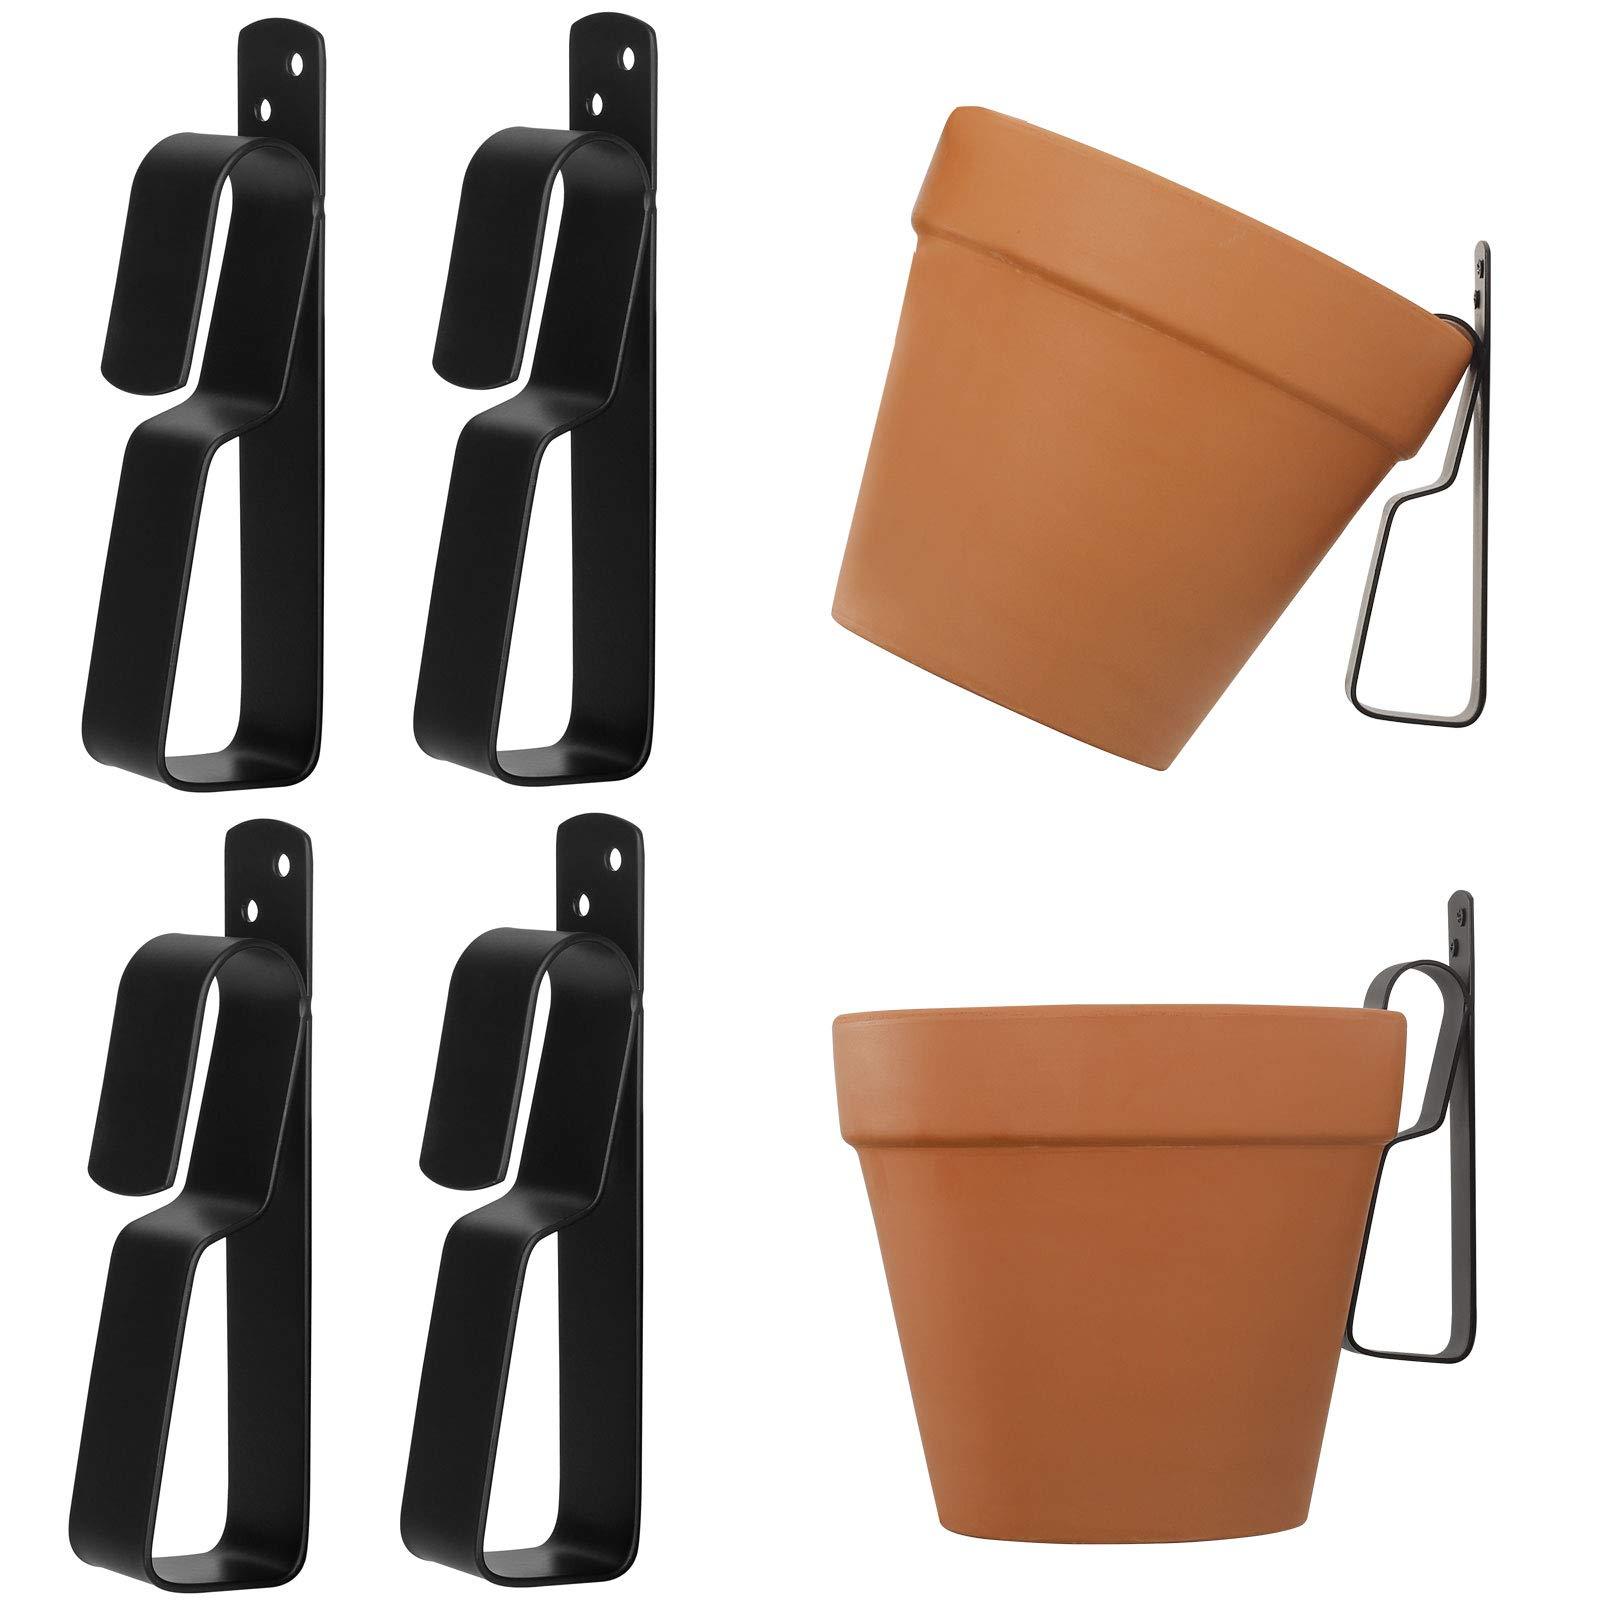 Terracotta Pots Hangers,ChasBete Wall Plant Hanger Hook for 10cm to 23cm Terracotta Pot, Stainless Steel Plant Hangers Indoor/Outdoor,4 Pack